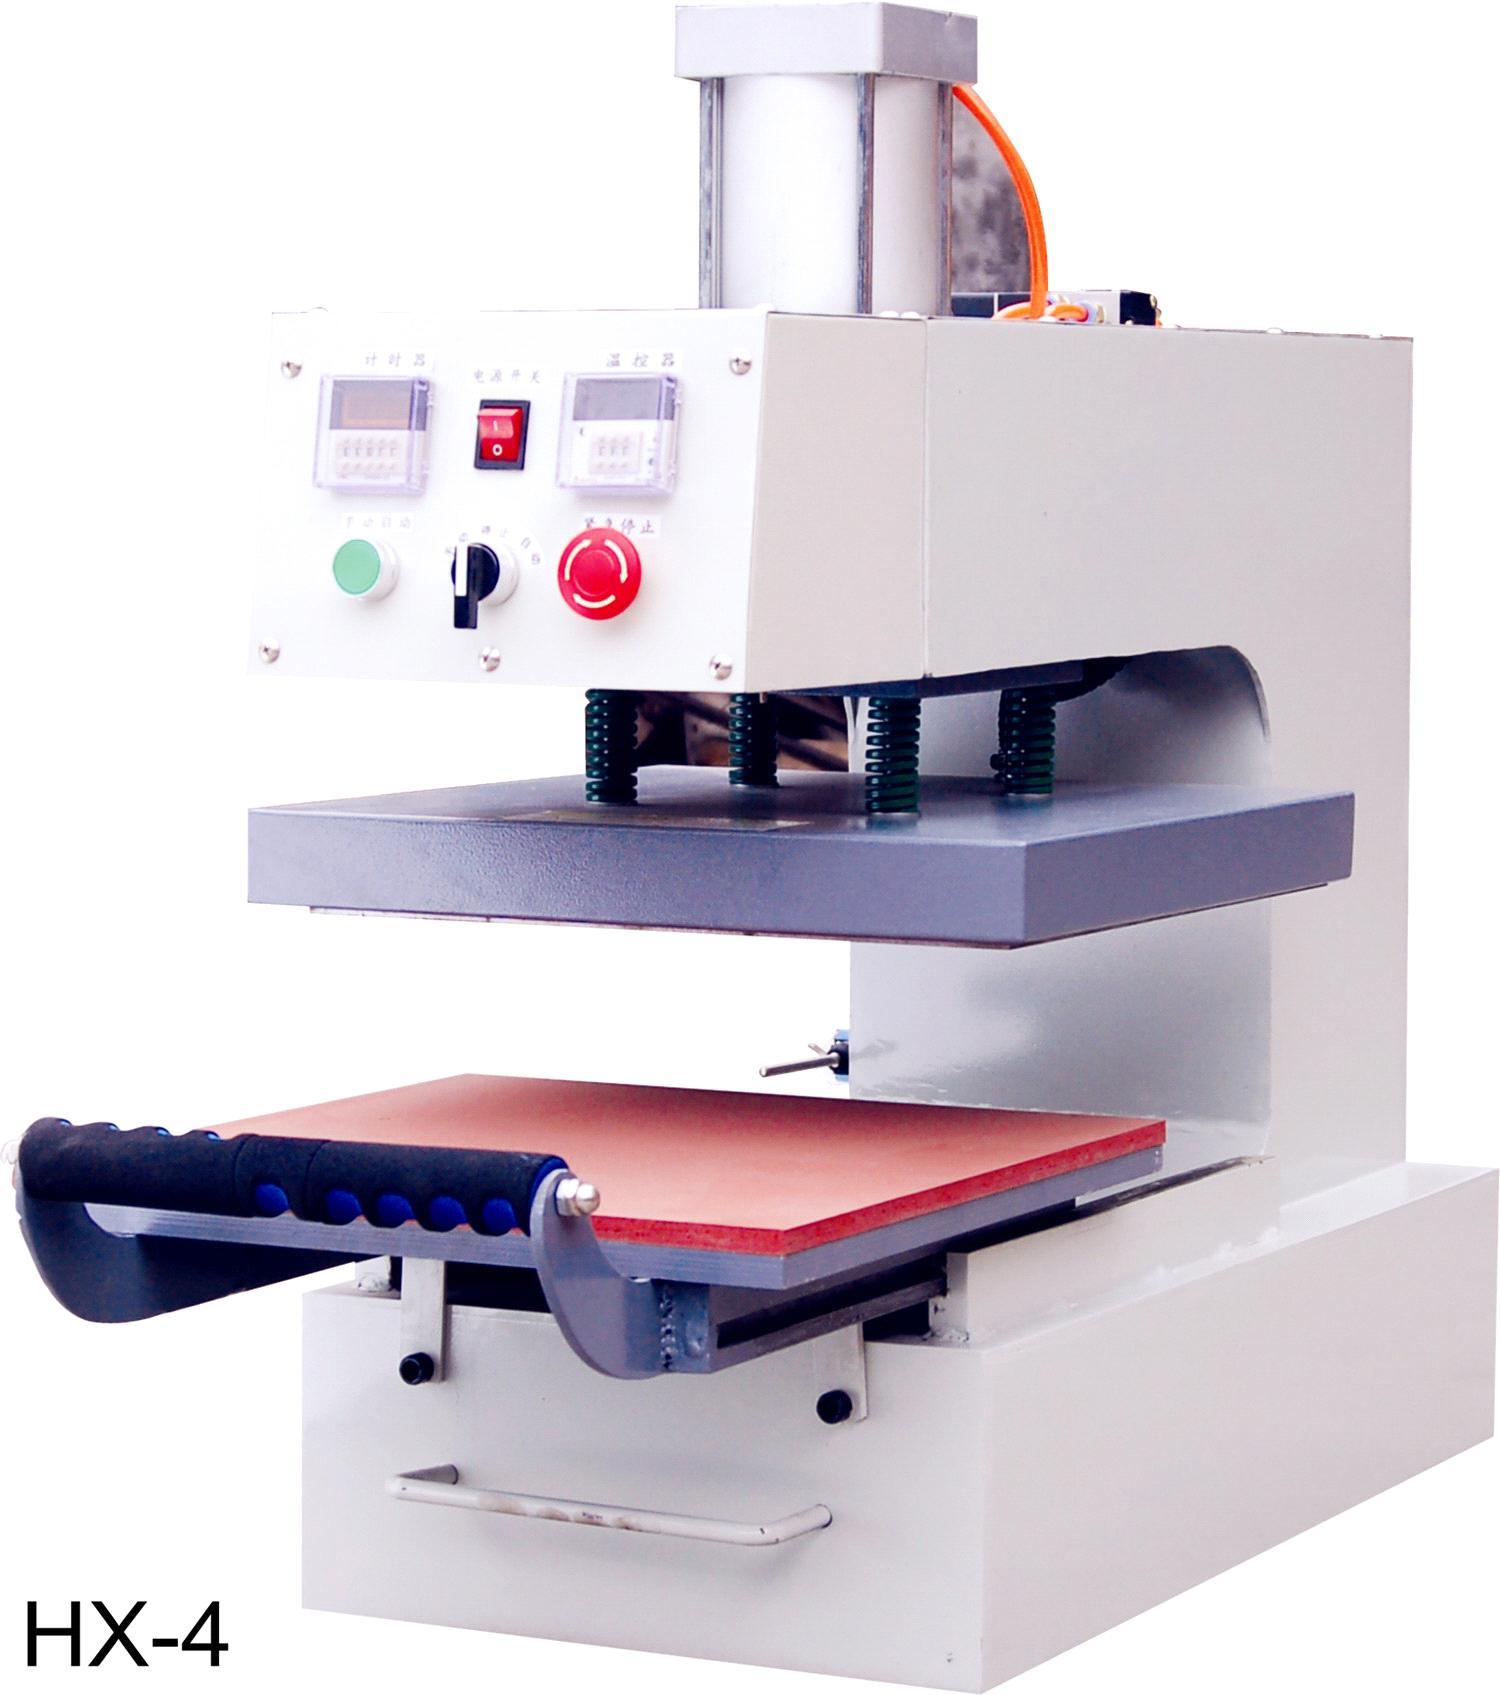 Cylinder Mug Printer - Print Cylindrical Substrates (Video) - Digital -  Heat Press Machine - QA